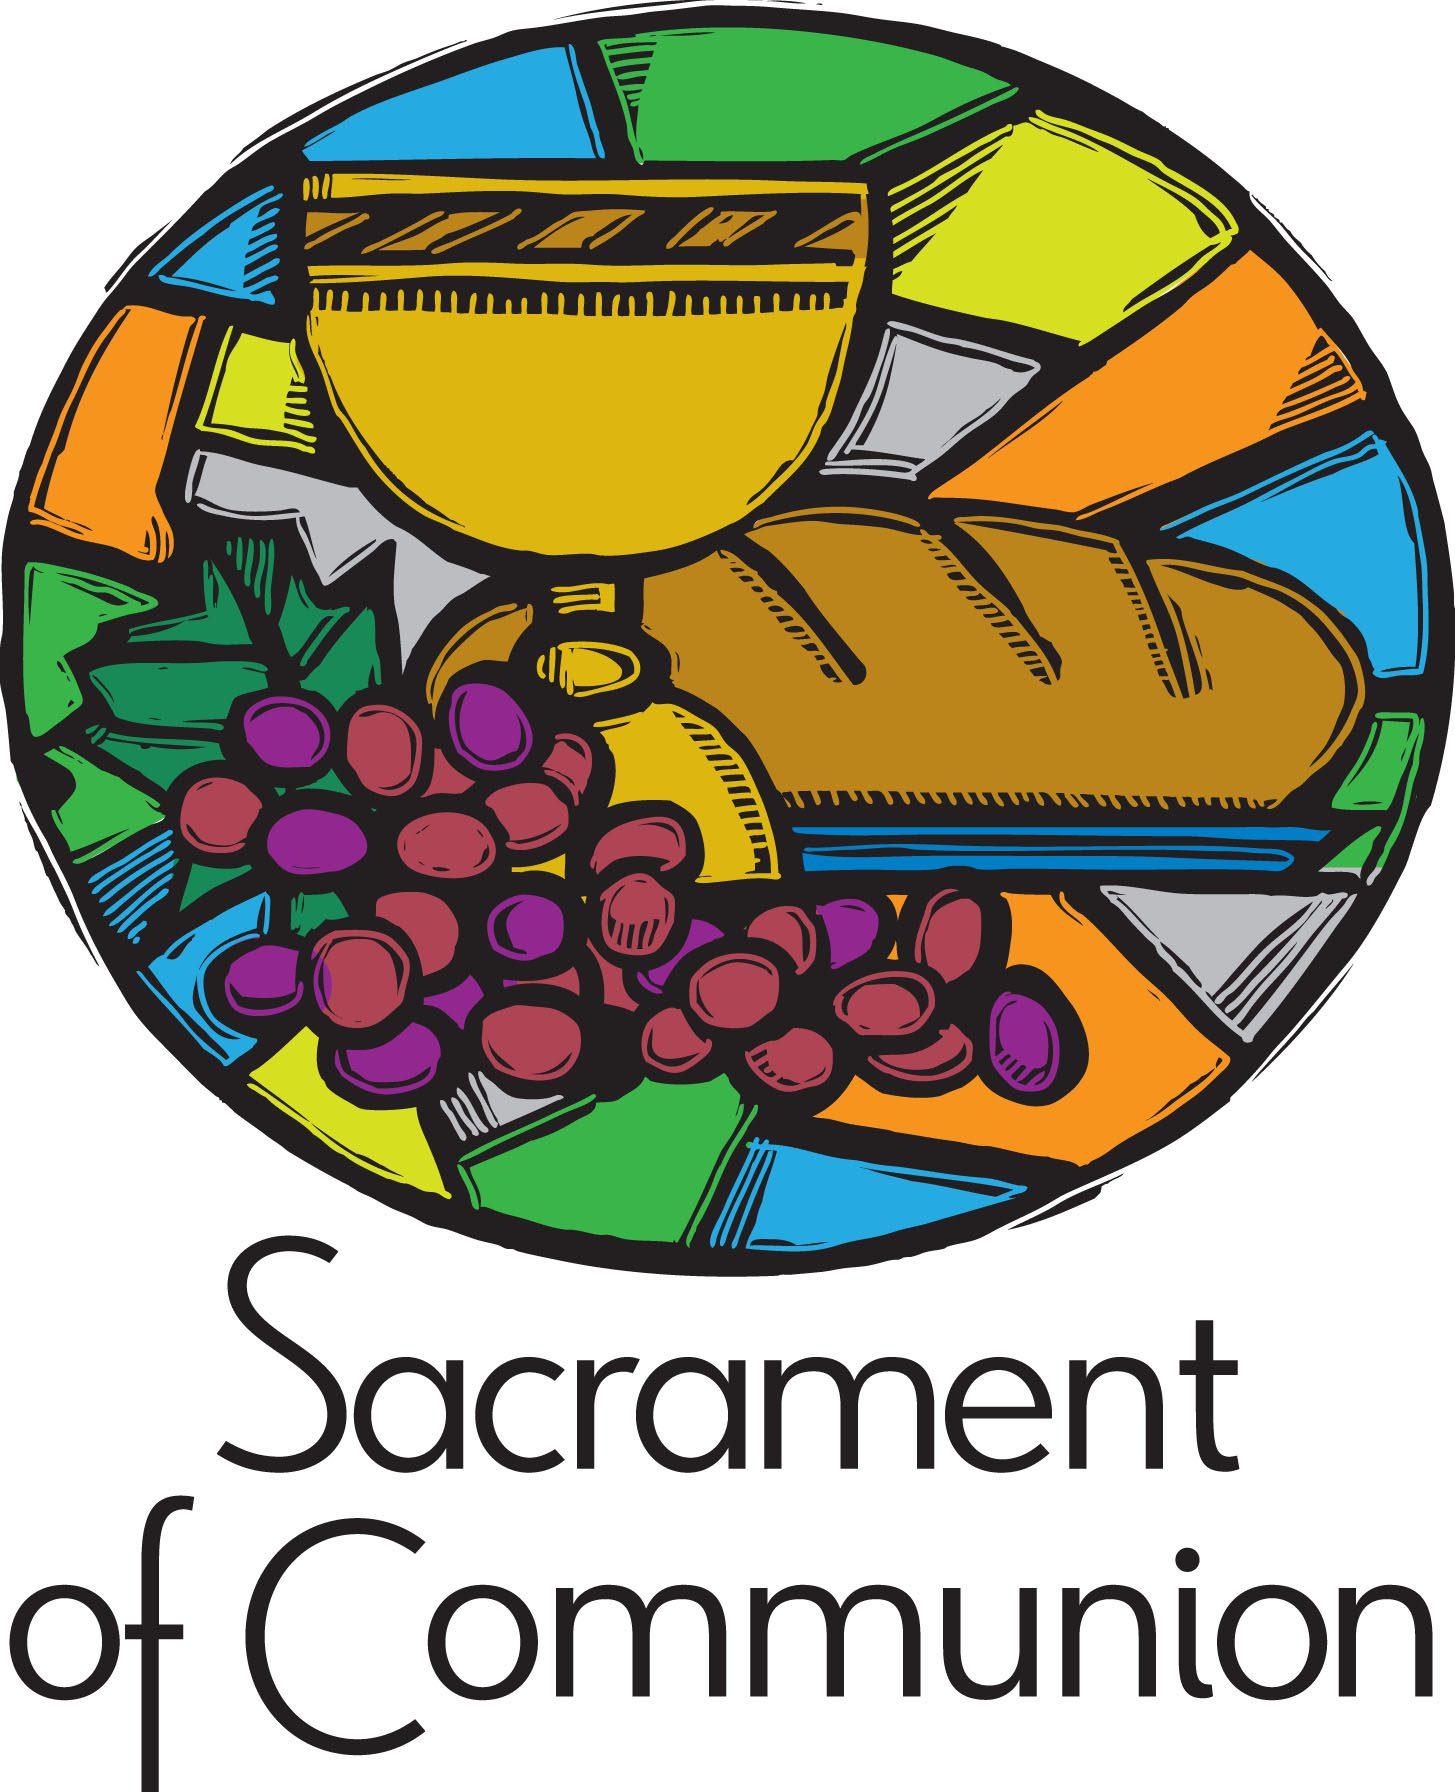 Ruling Elder Training For Presiding At The Sacrament Of